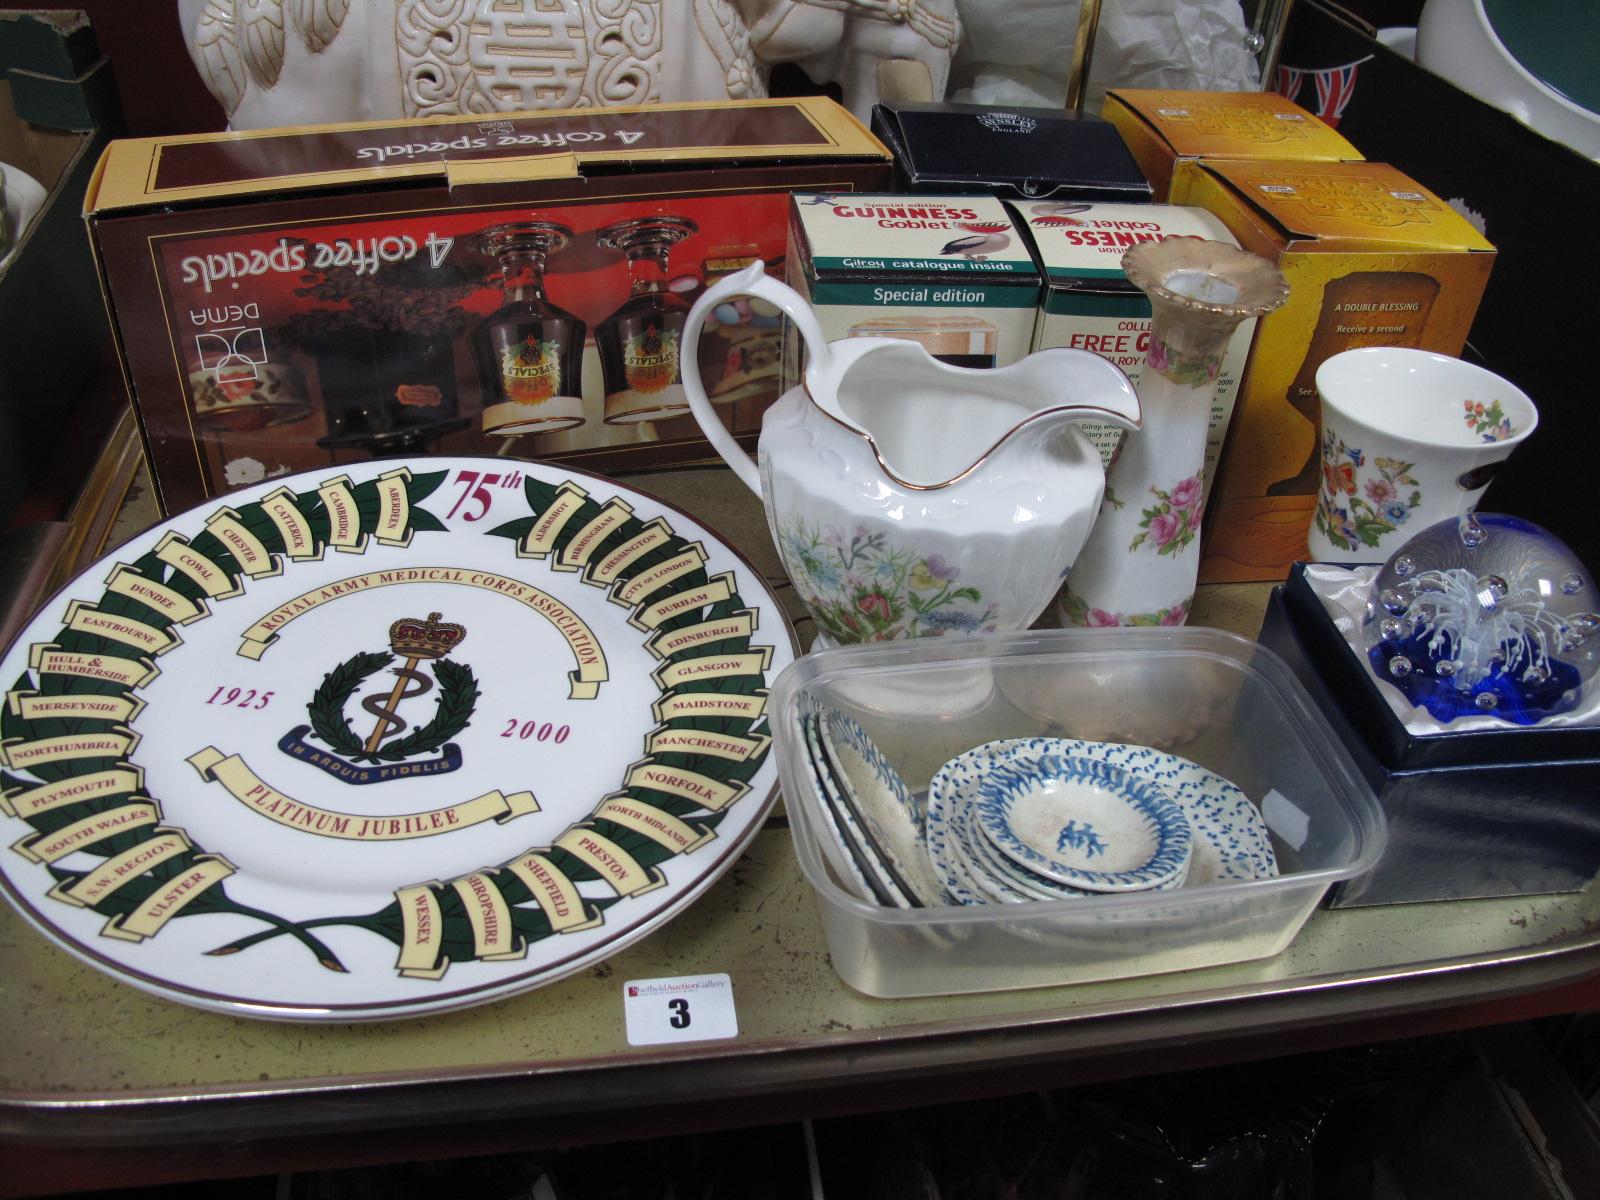 Lot 3 - Nine XIX Century Hand Painted Dolls Dinner Plates, Aynsley ceramics, Army Medical Corps plates,